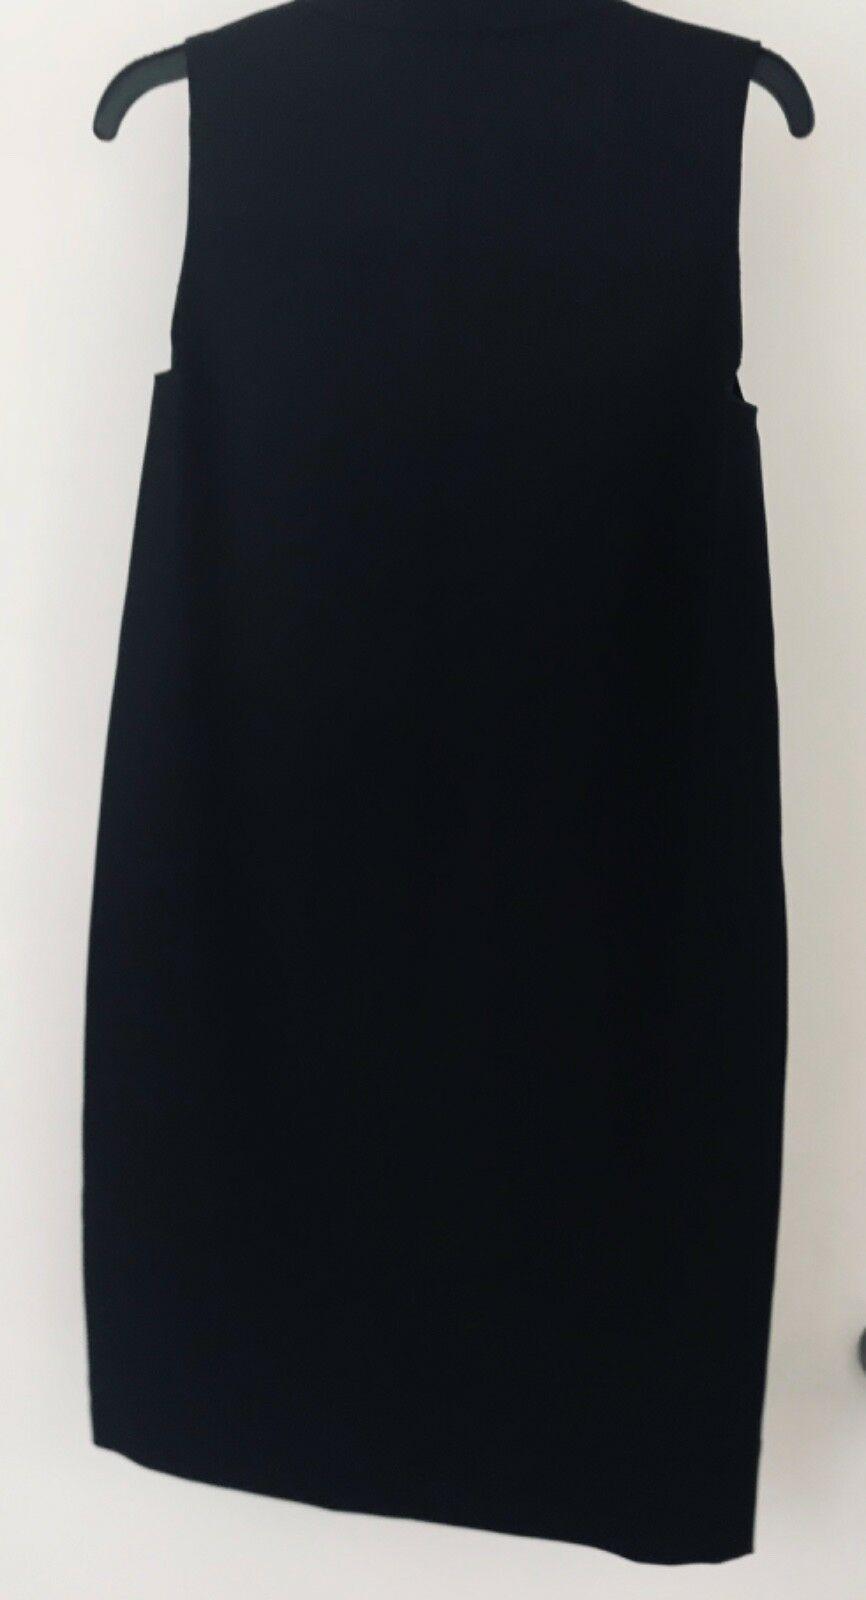 Anne Klein Womens Black Dress Size S Draped necklineNWT